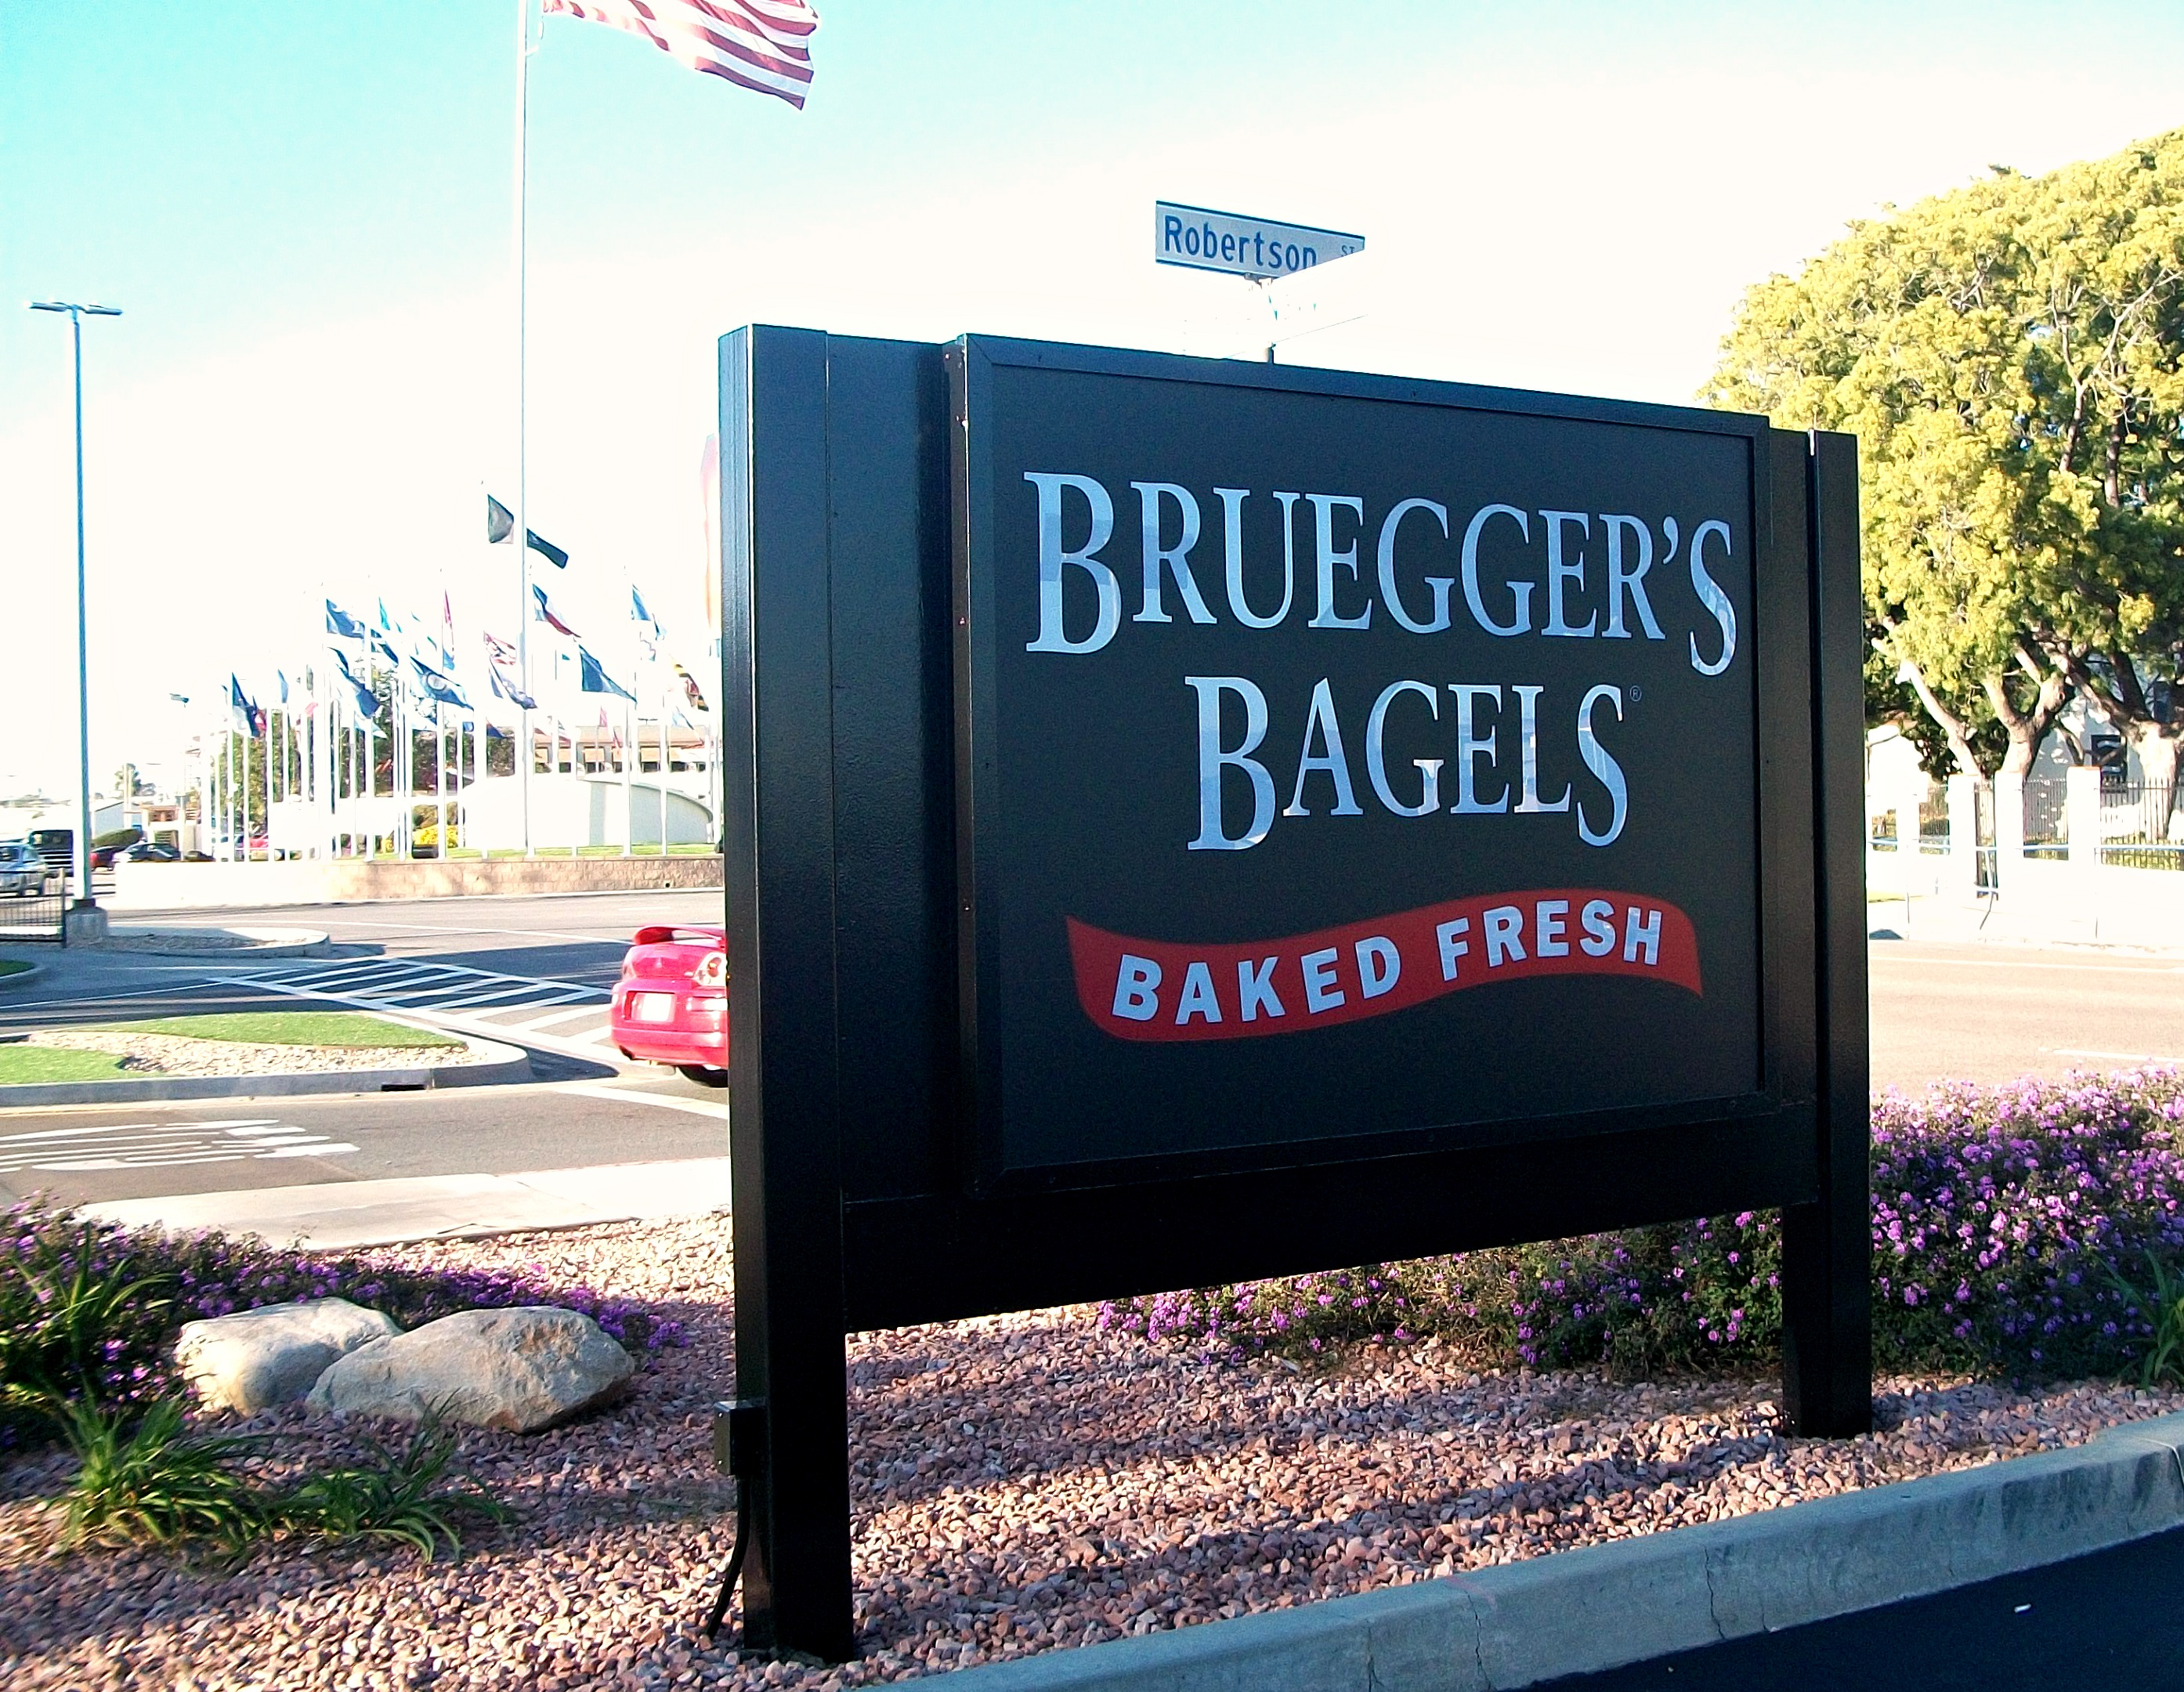 Bruegger's Bagels | Naval Base, San Diego, CA